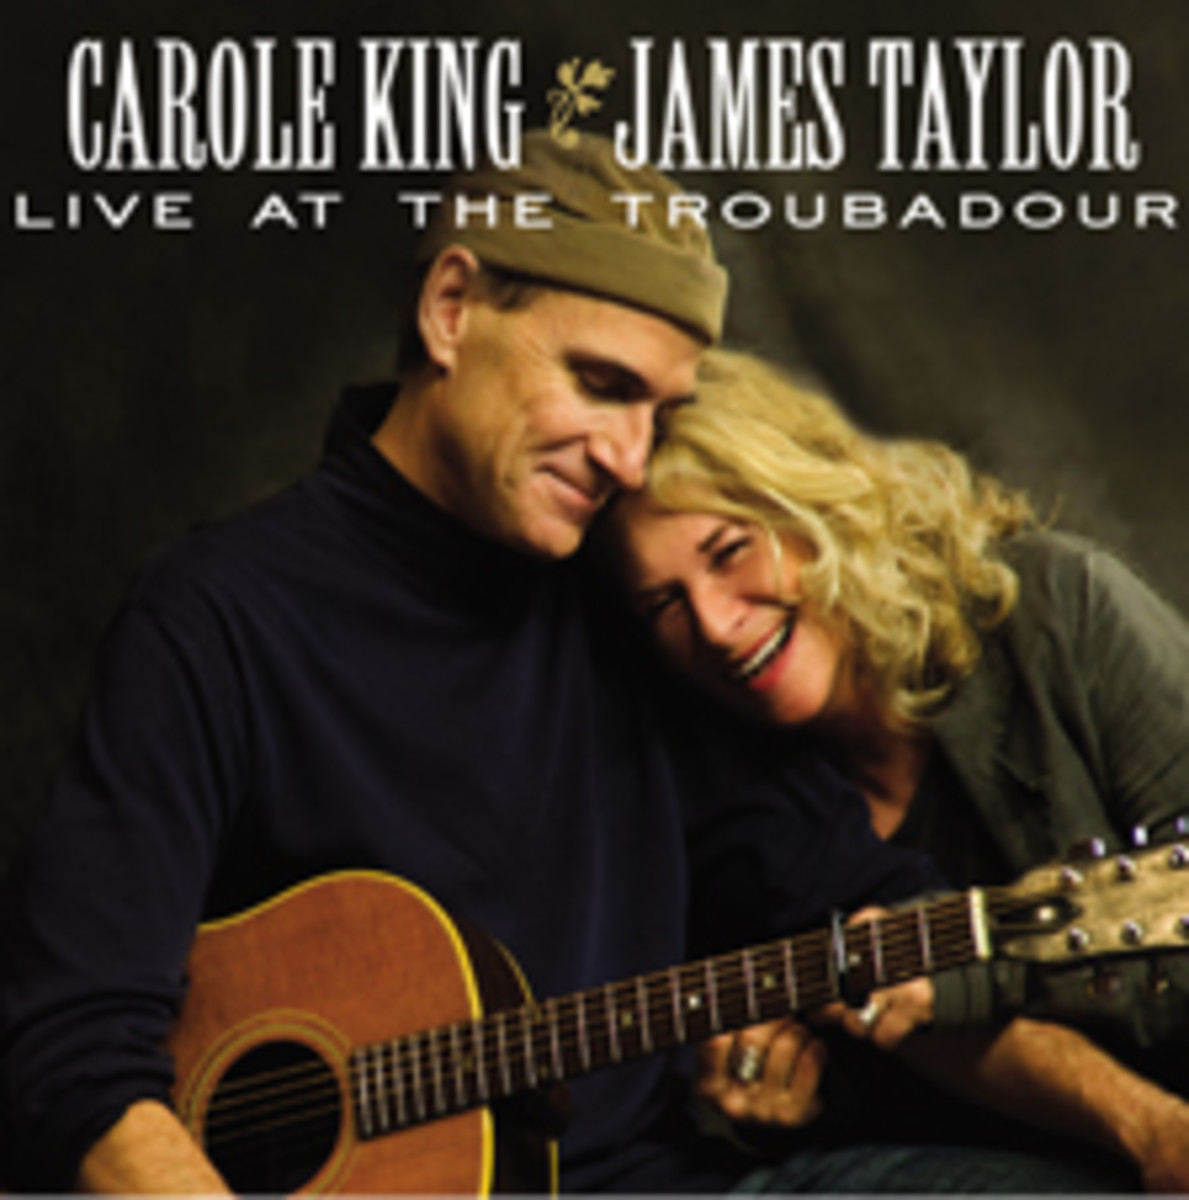 Caole_King_James_Taylor